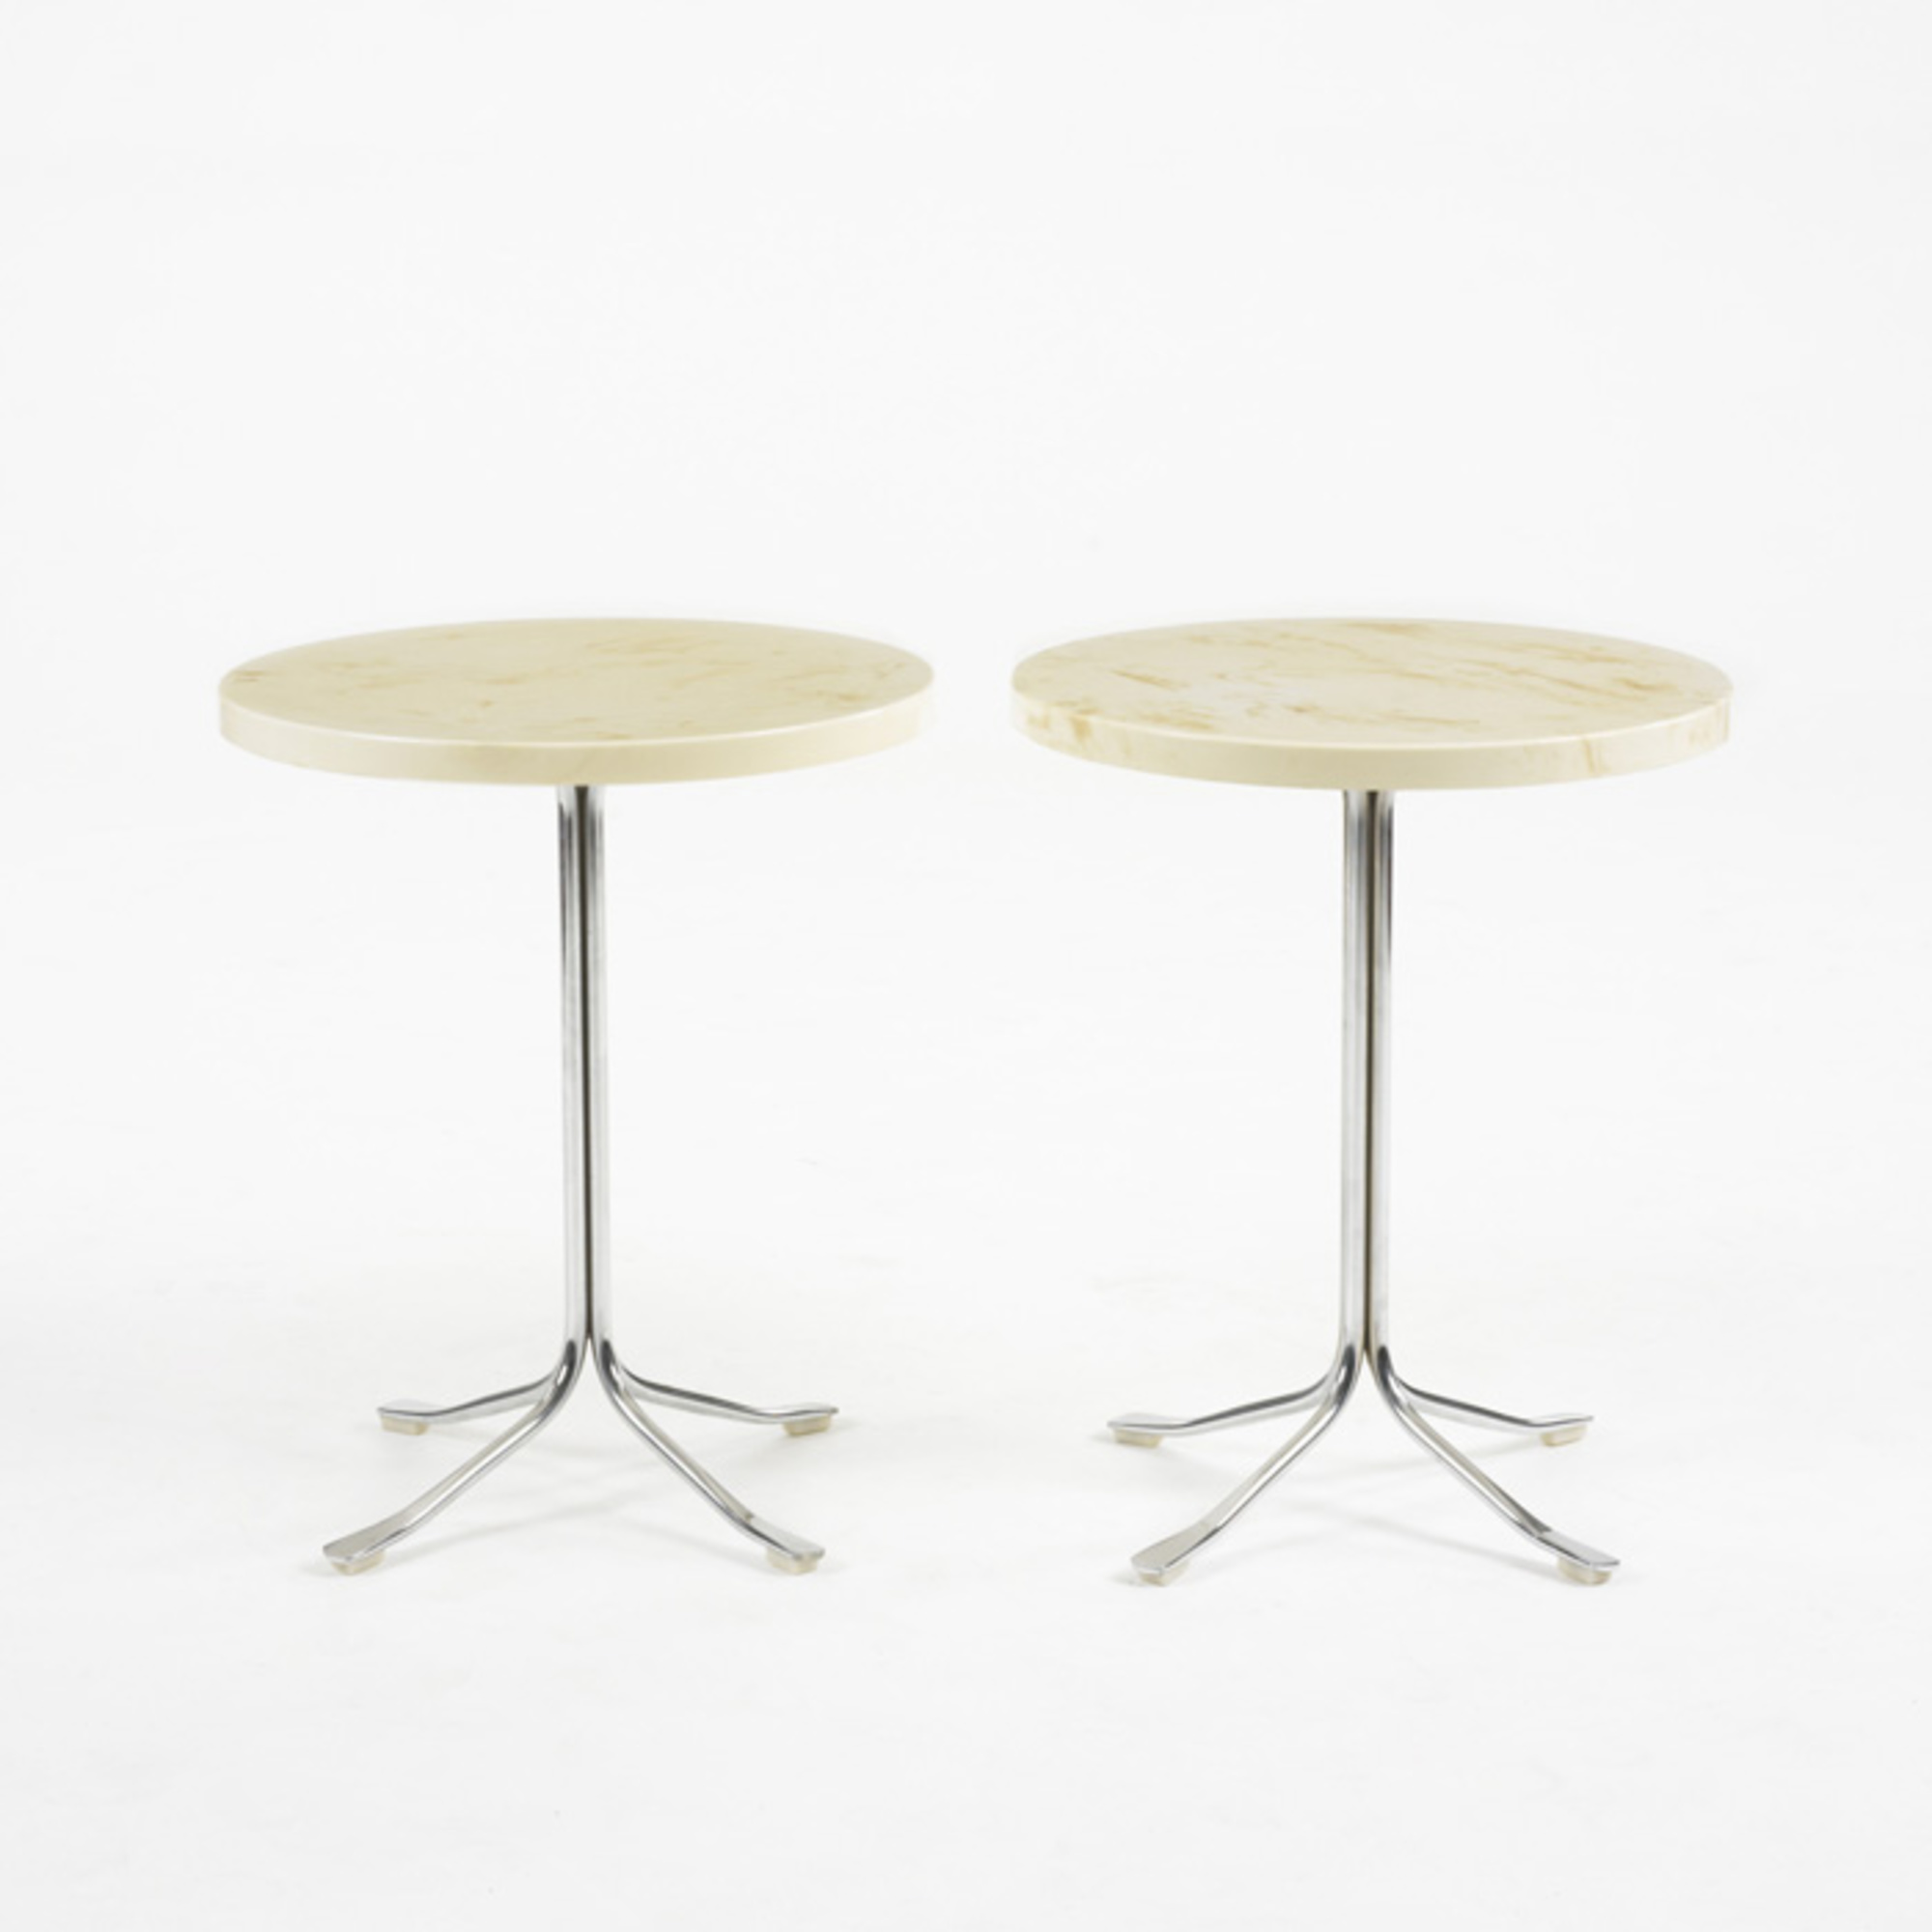 buy popular f2d29 a5116 360: GIDEON KRAMER, Ion occasional tables, pair < Mass ...